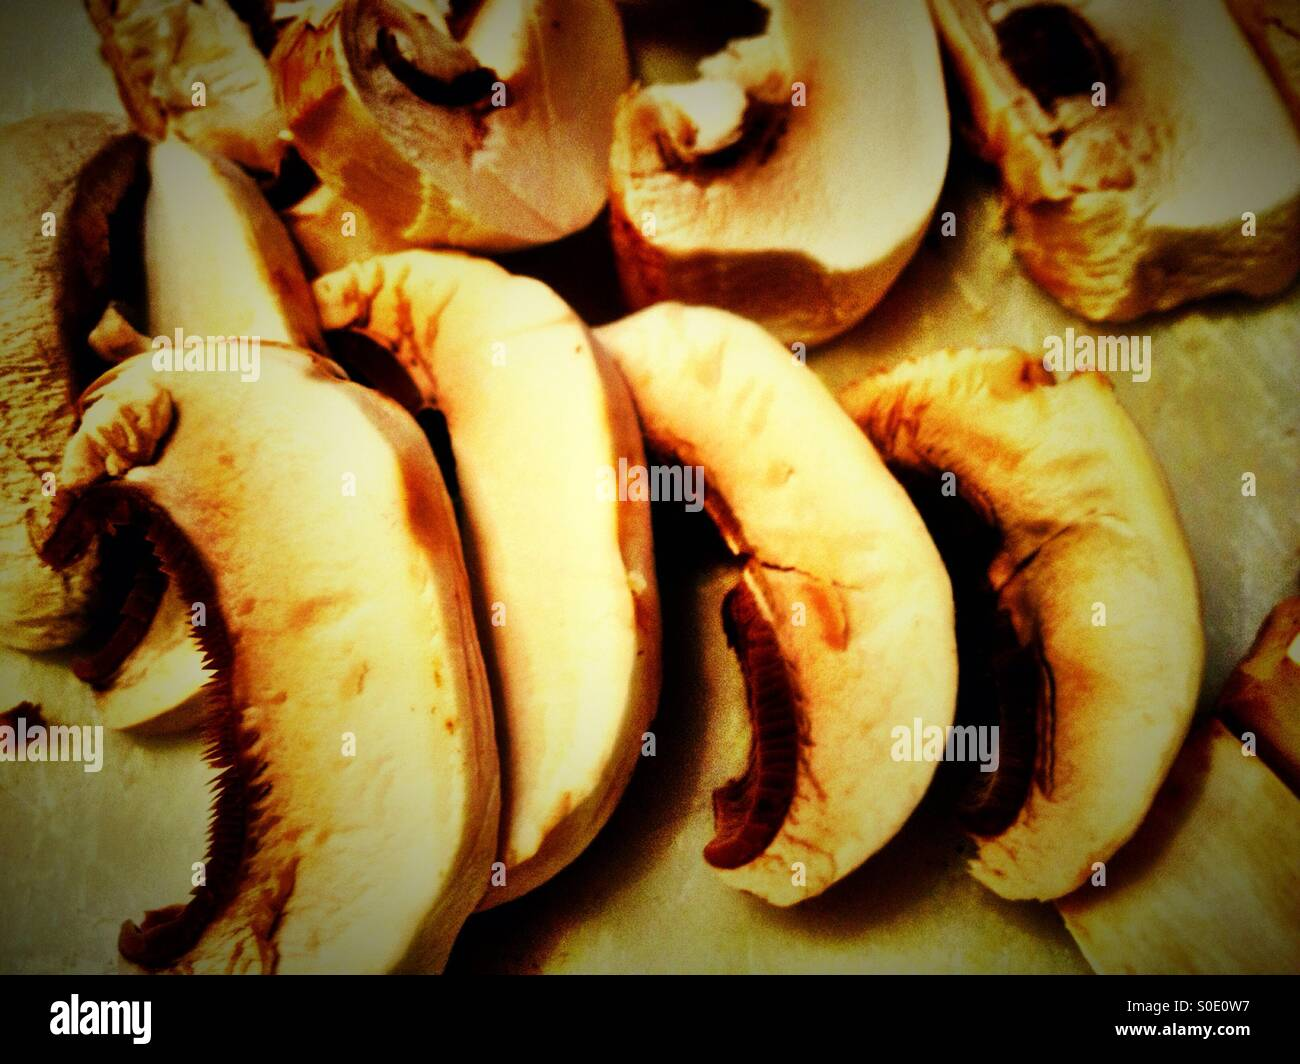 Sliced mushrooms. Stock Photo